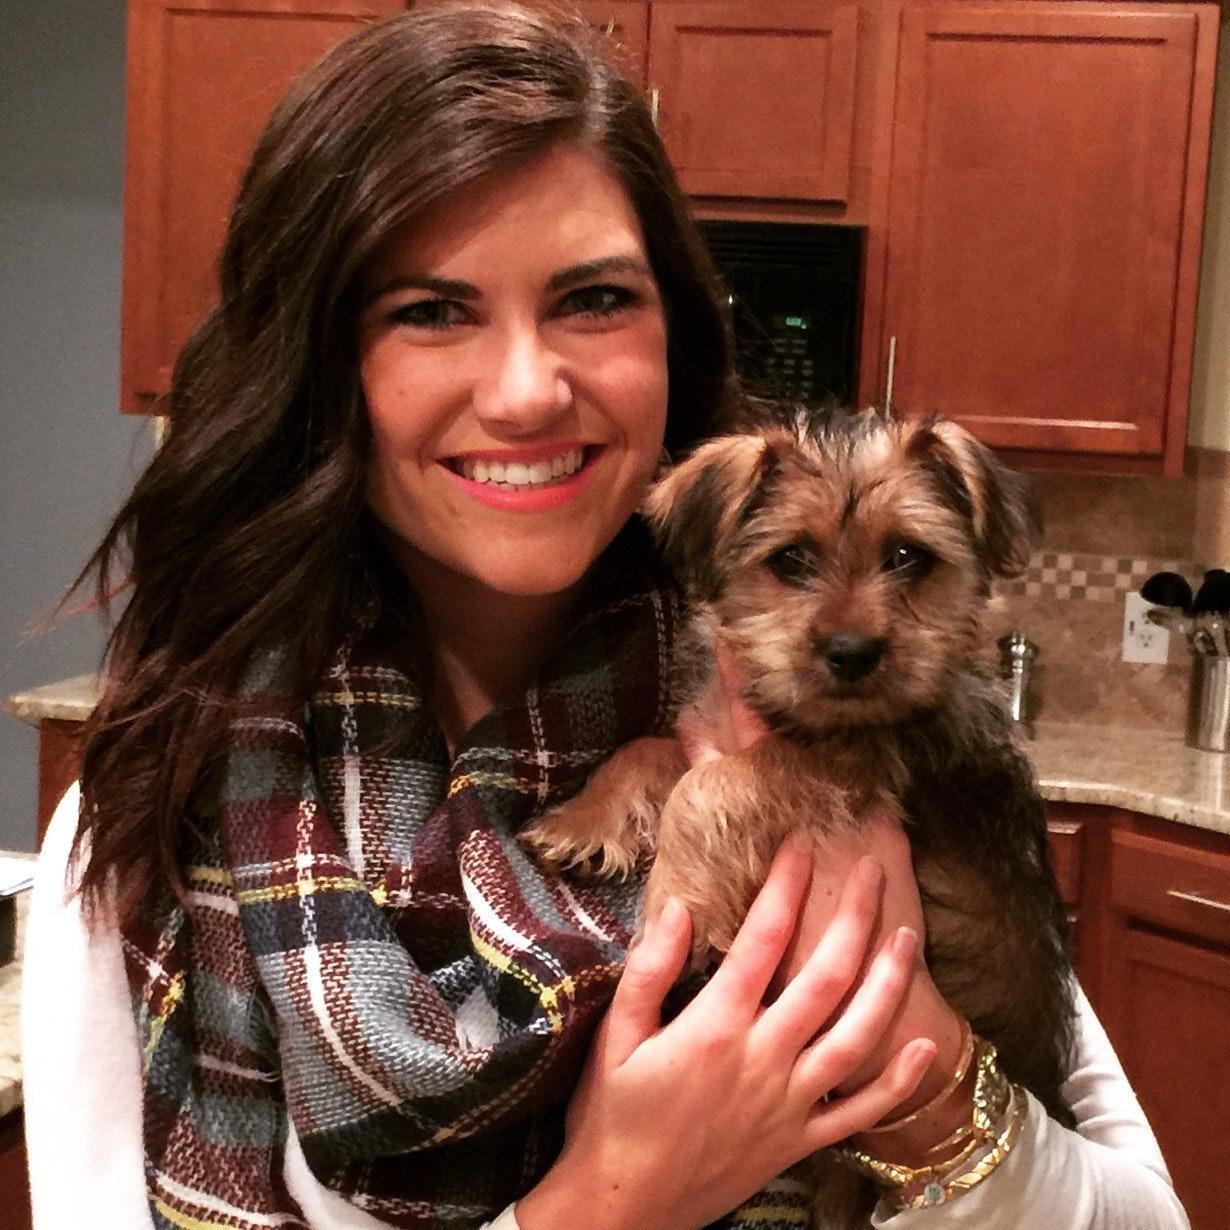 Brooke S.